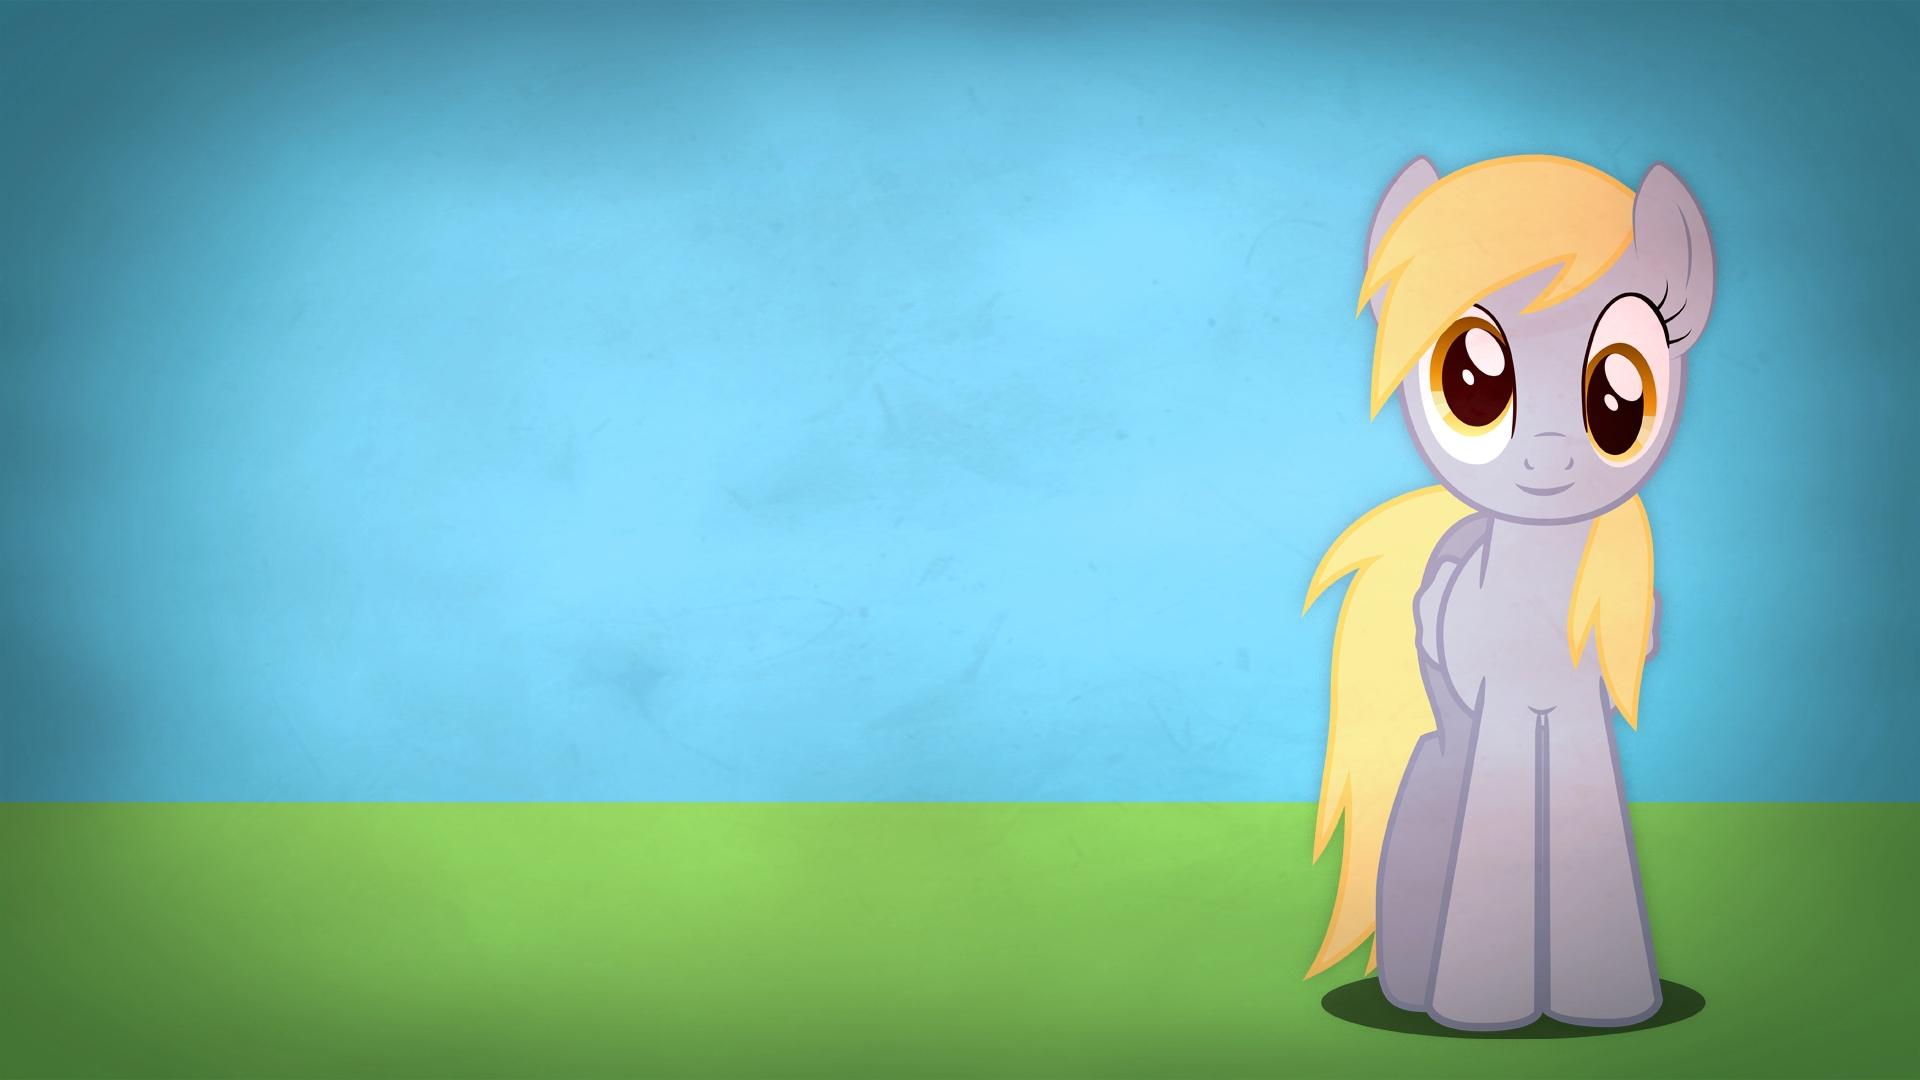 Derpy Background   My Little Pony Friendship is Magic Wallpaper 1920x1080